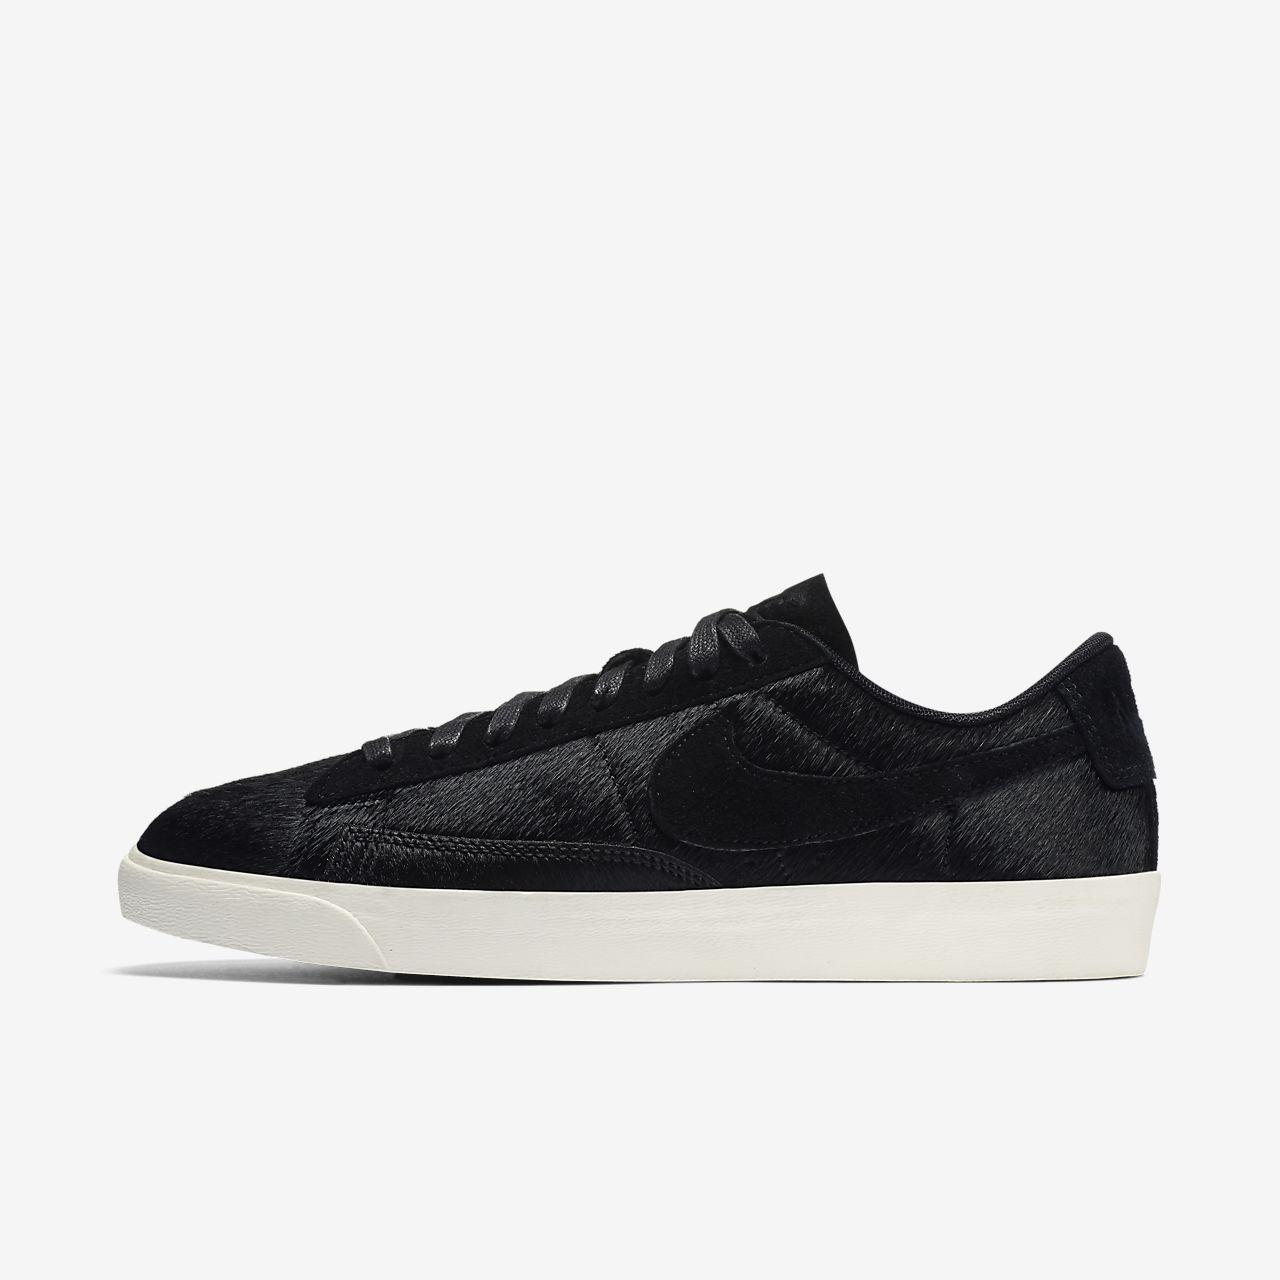 Nike Blazer Leather Shoes All Black /Nike Jordan [ N830]